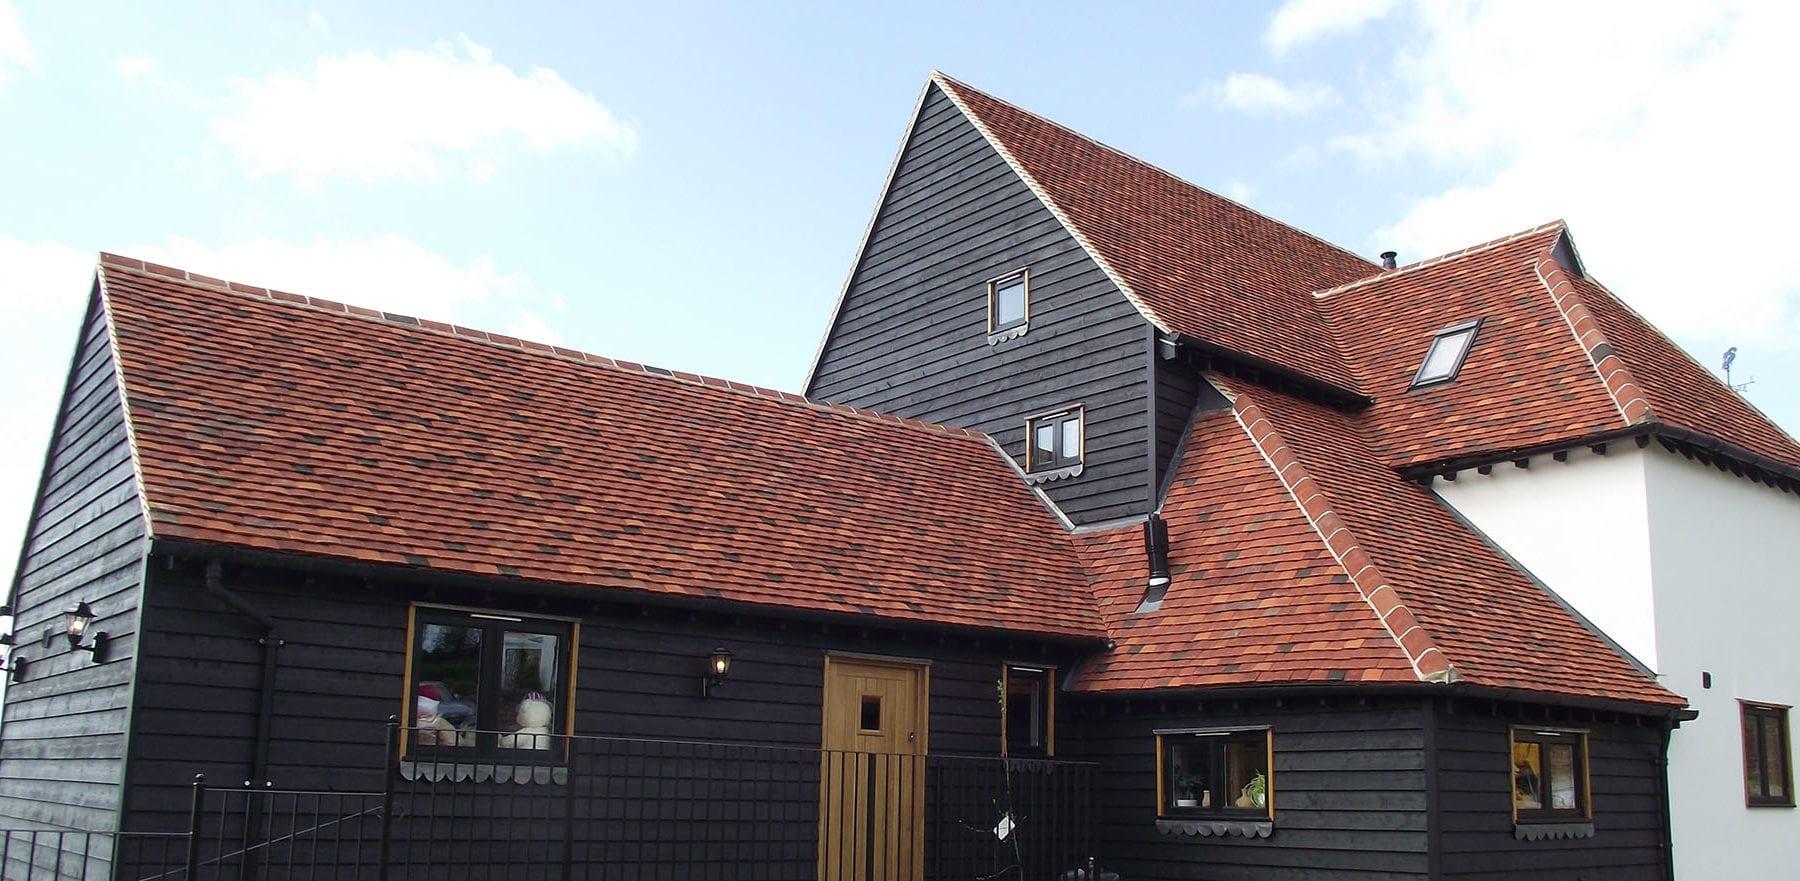 Lifestiles - Handmade Multi Clay Roof Tiles - De Vere, England 3